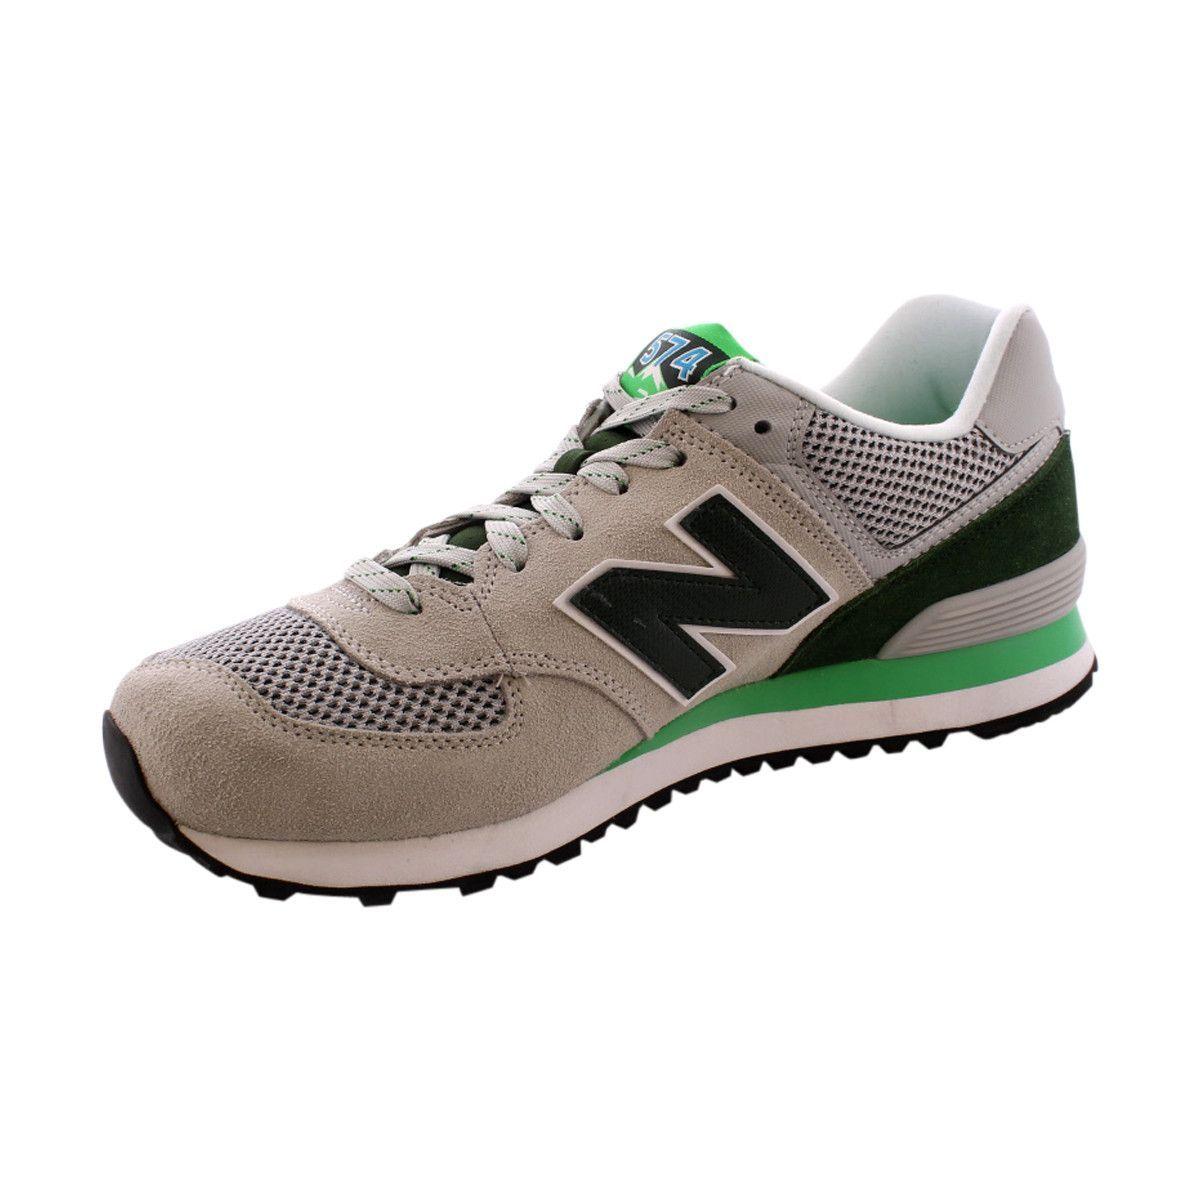 New Balance - Men's Day Hiker Run 574 Sneakers - Grey/Green